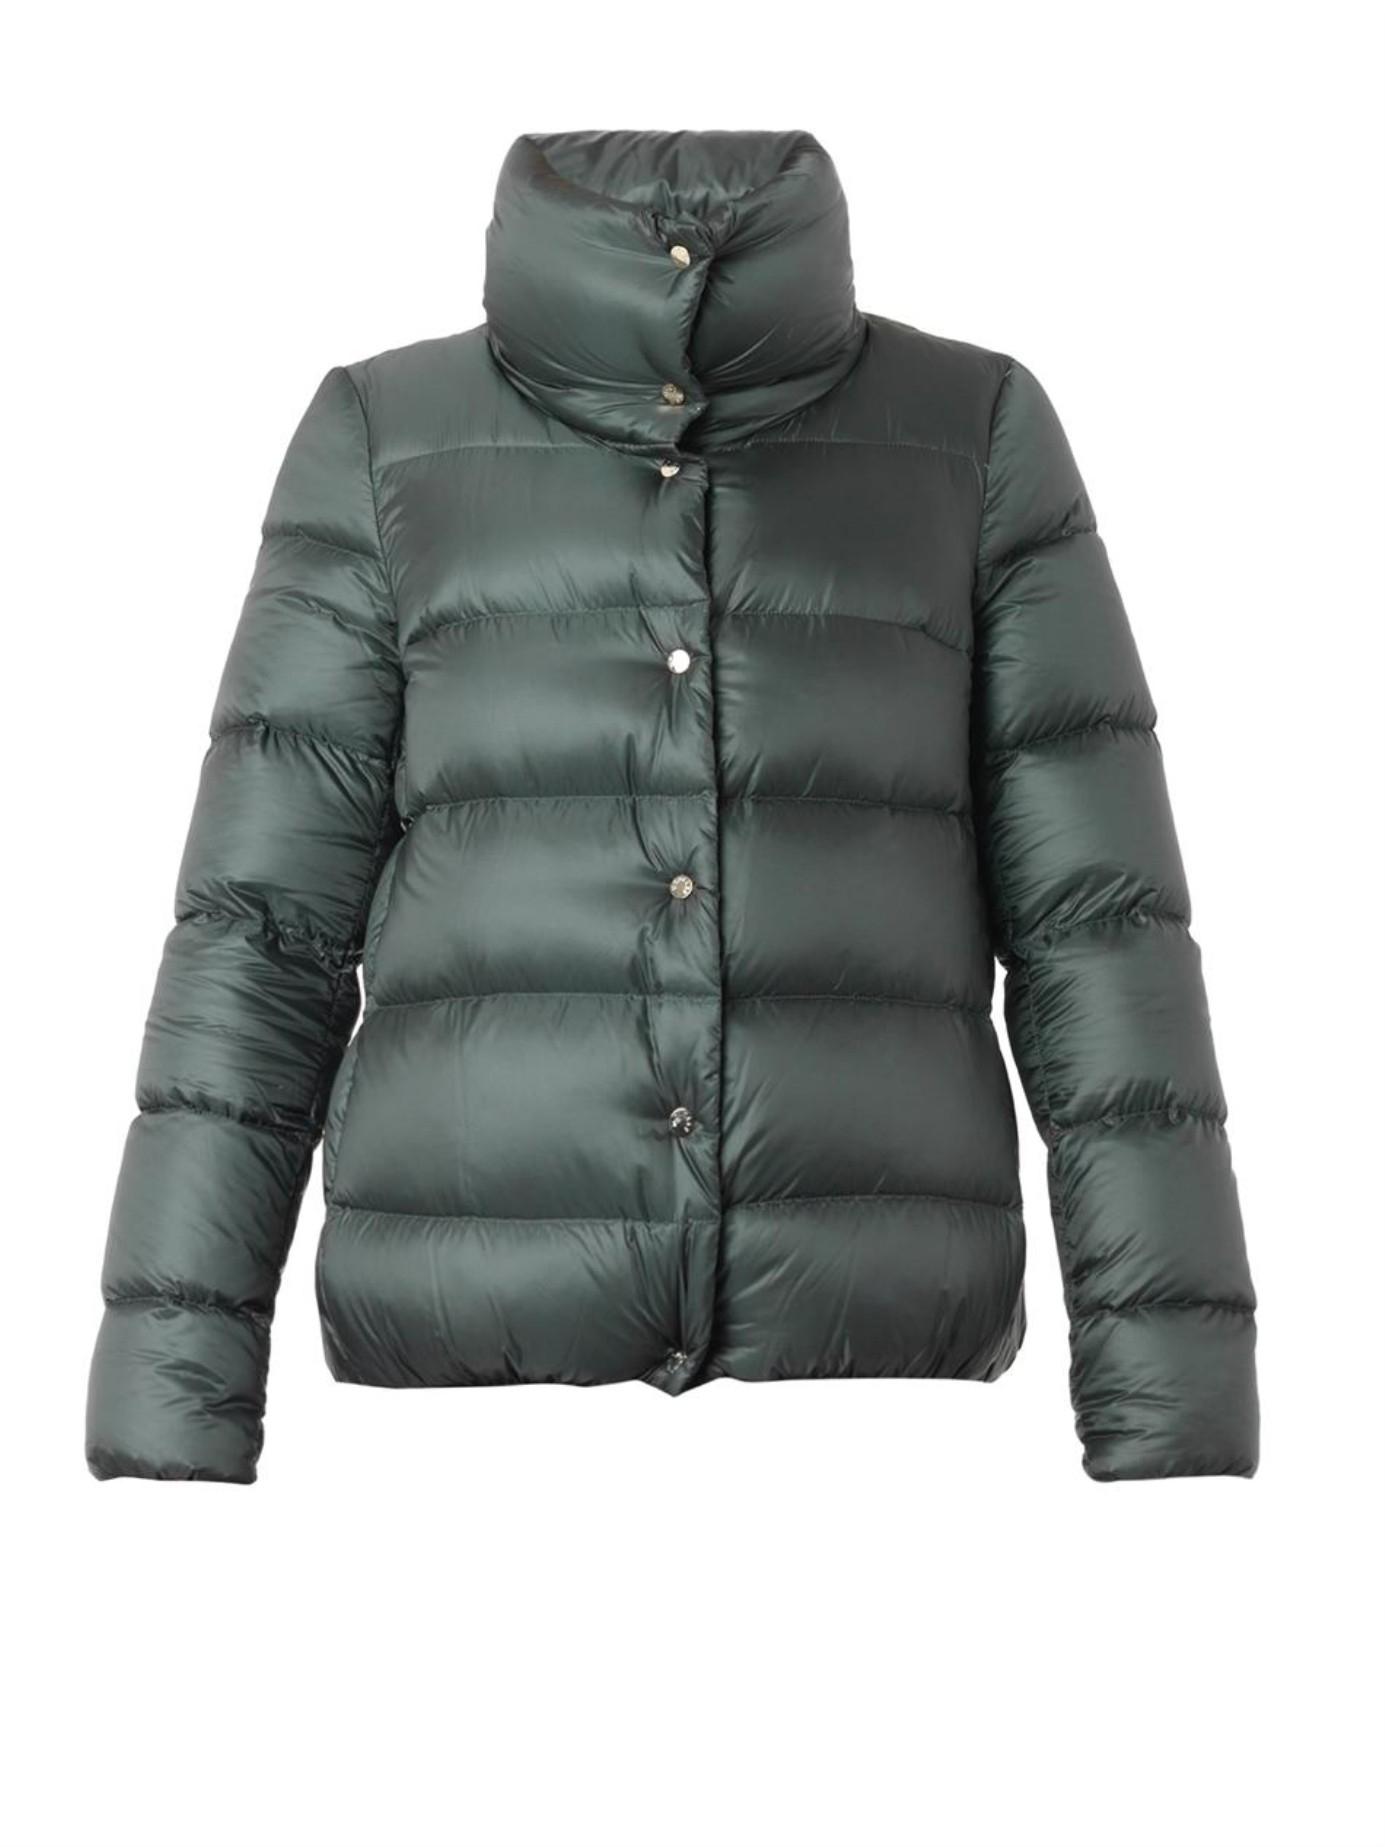 moncler green down jacket